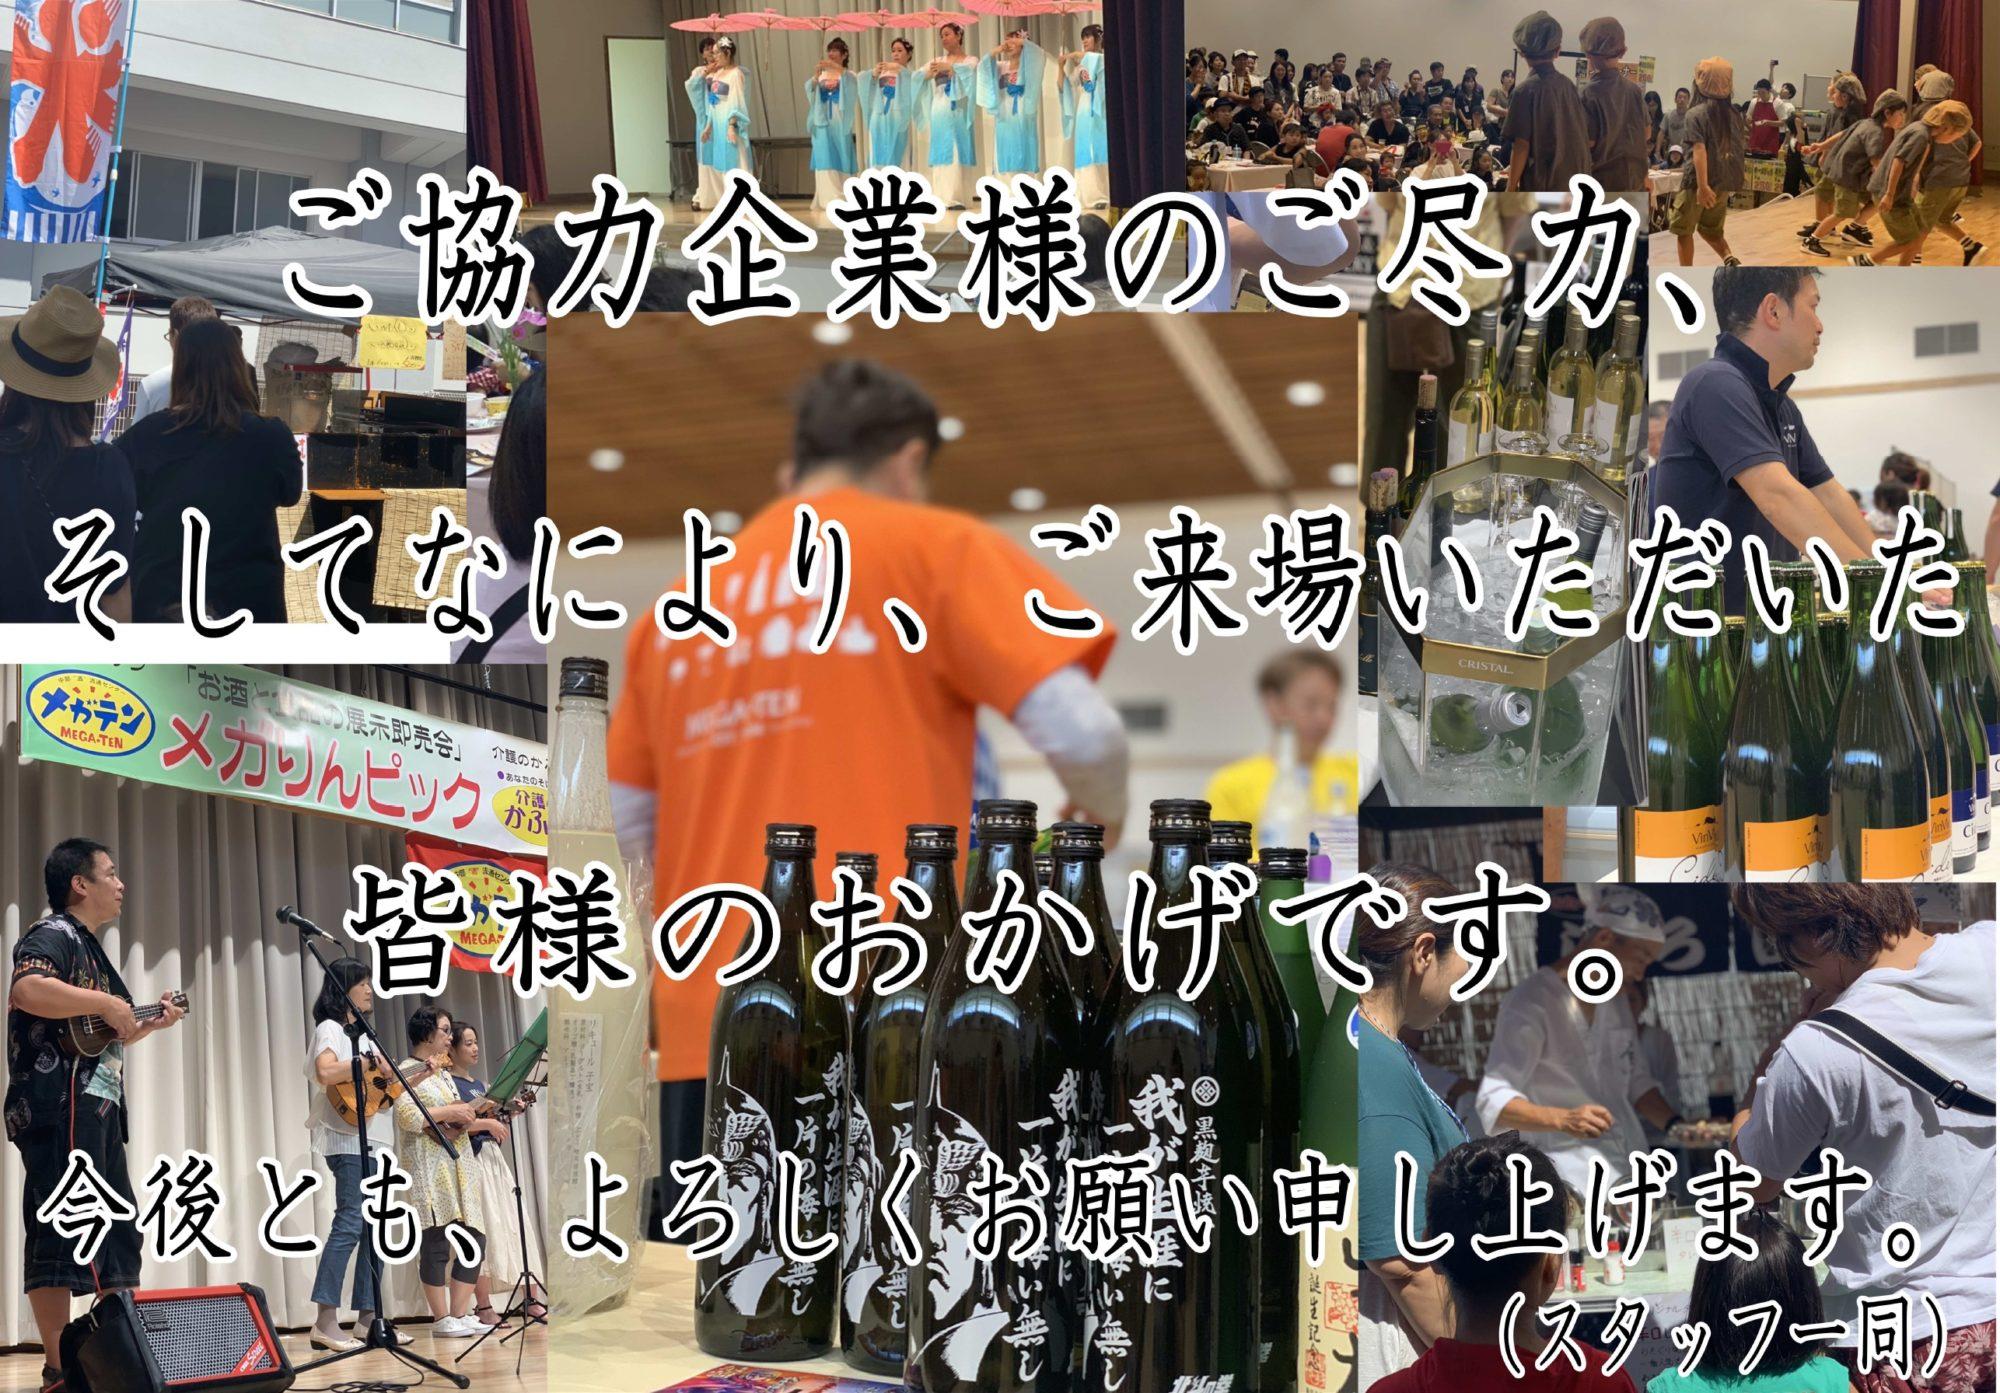 2019年9月14日~2019年9月15日 酒祭り無事閉幕!(3)